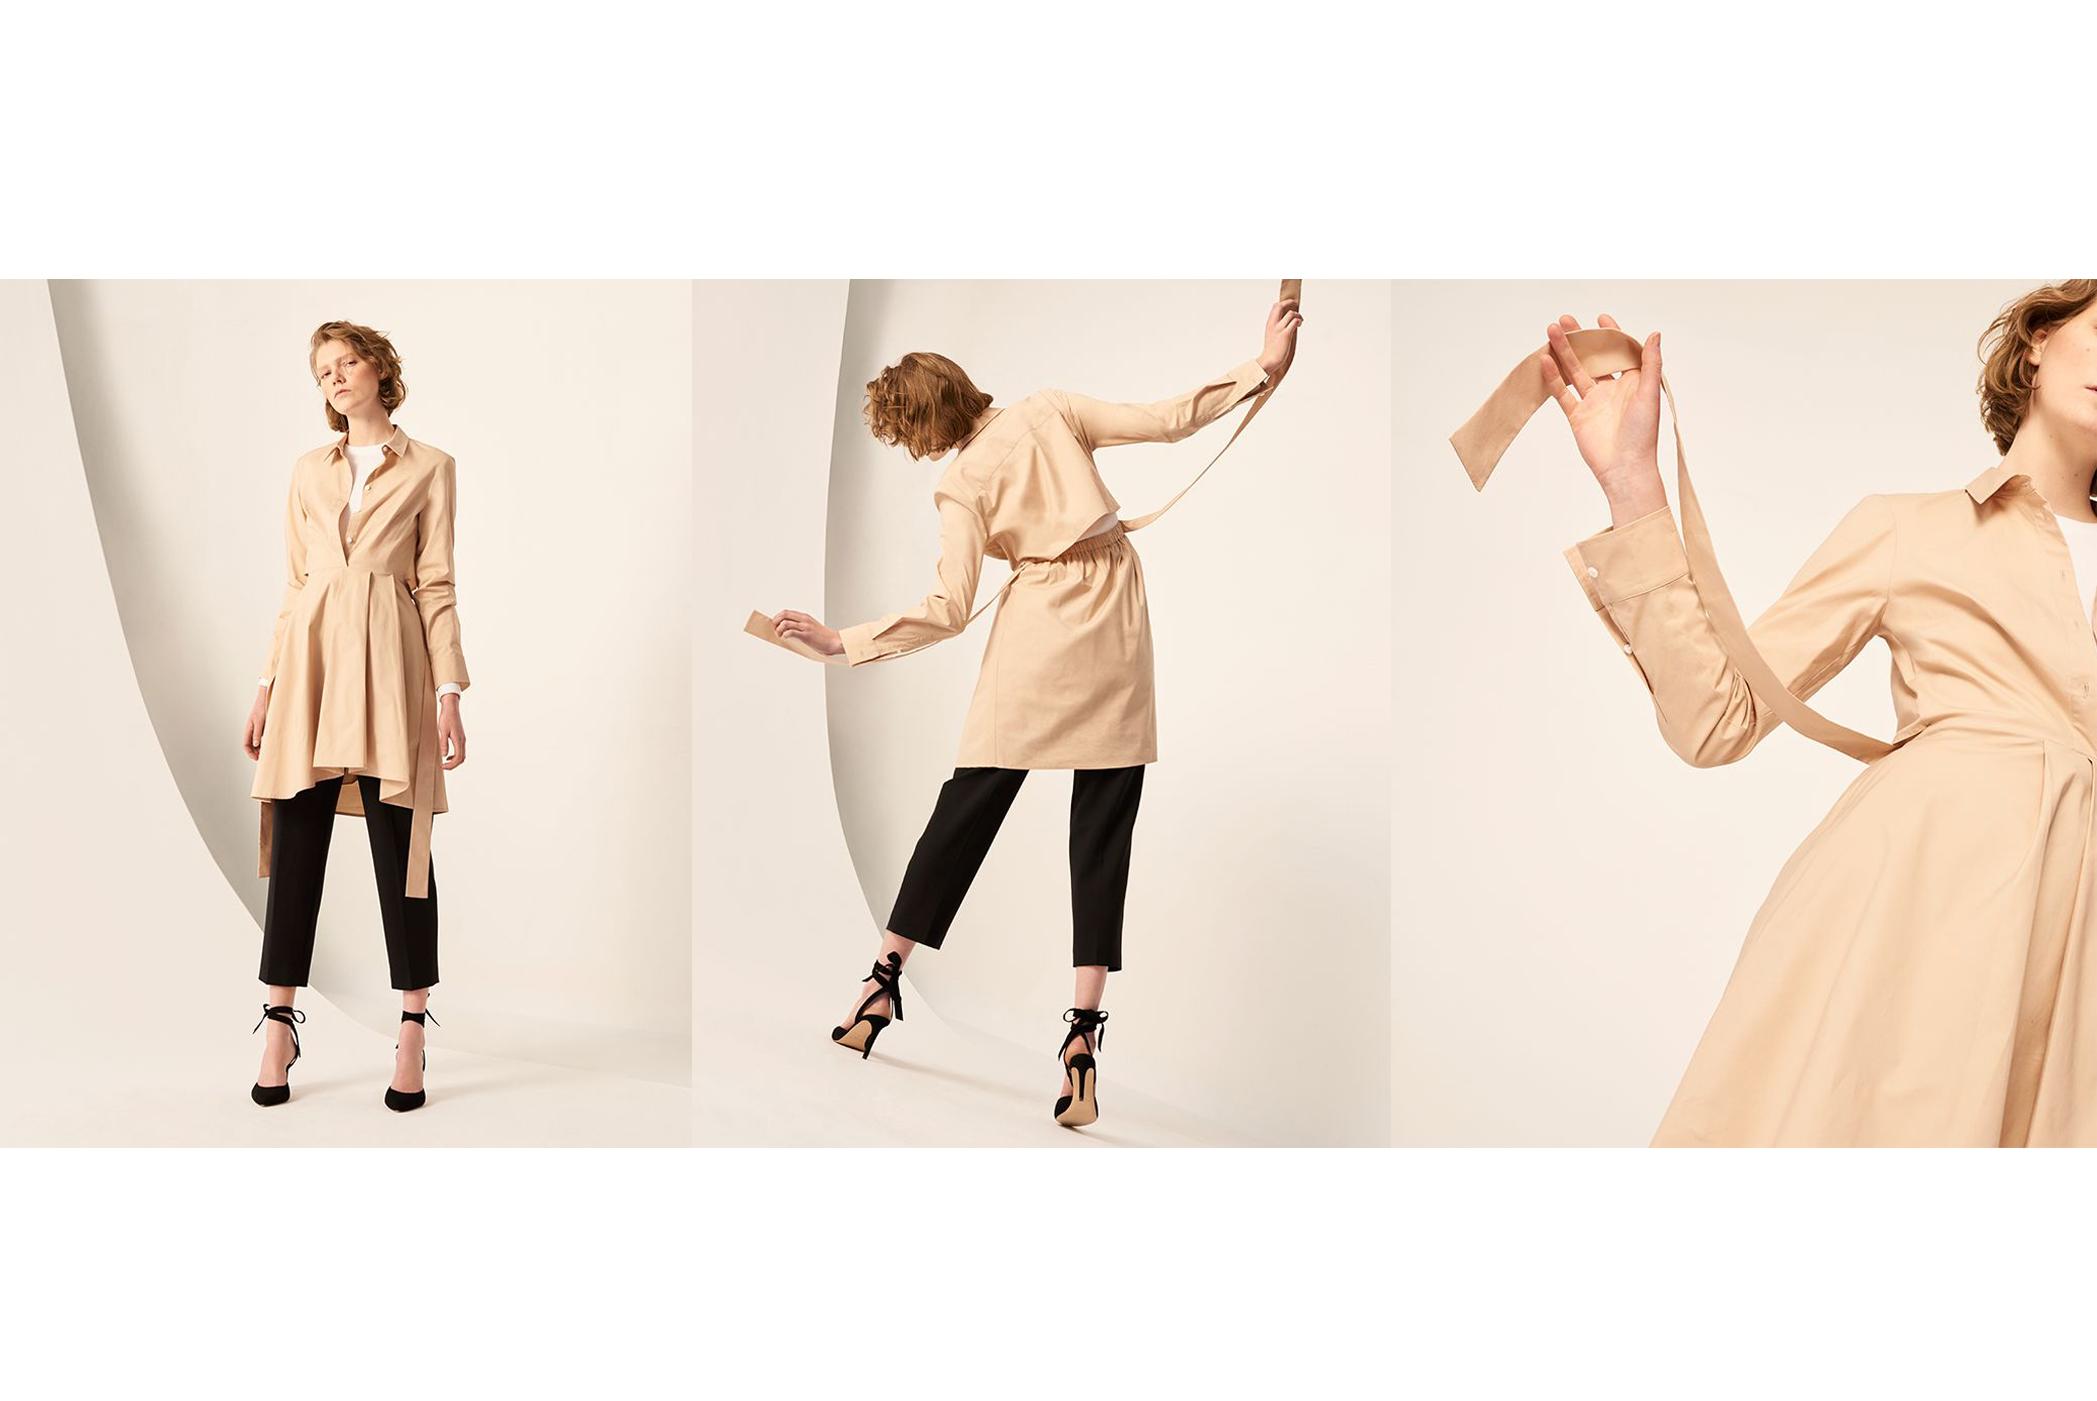 CAROLENA TOP, SHAPIRA DRESS, BORREM PANT, SHOBANA PUMP